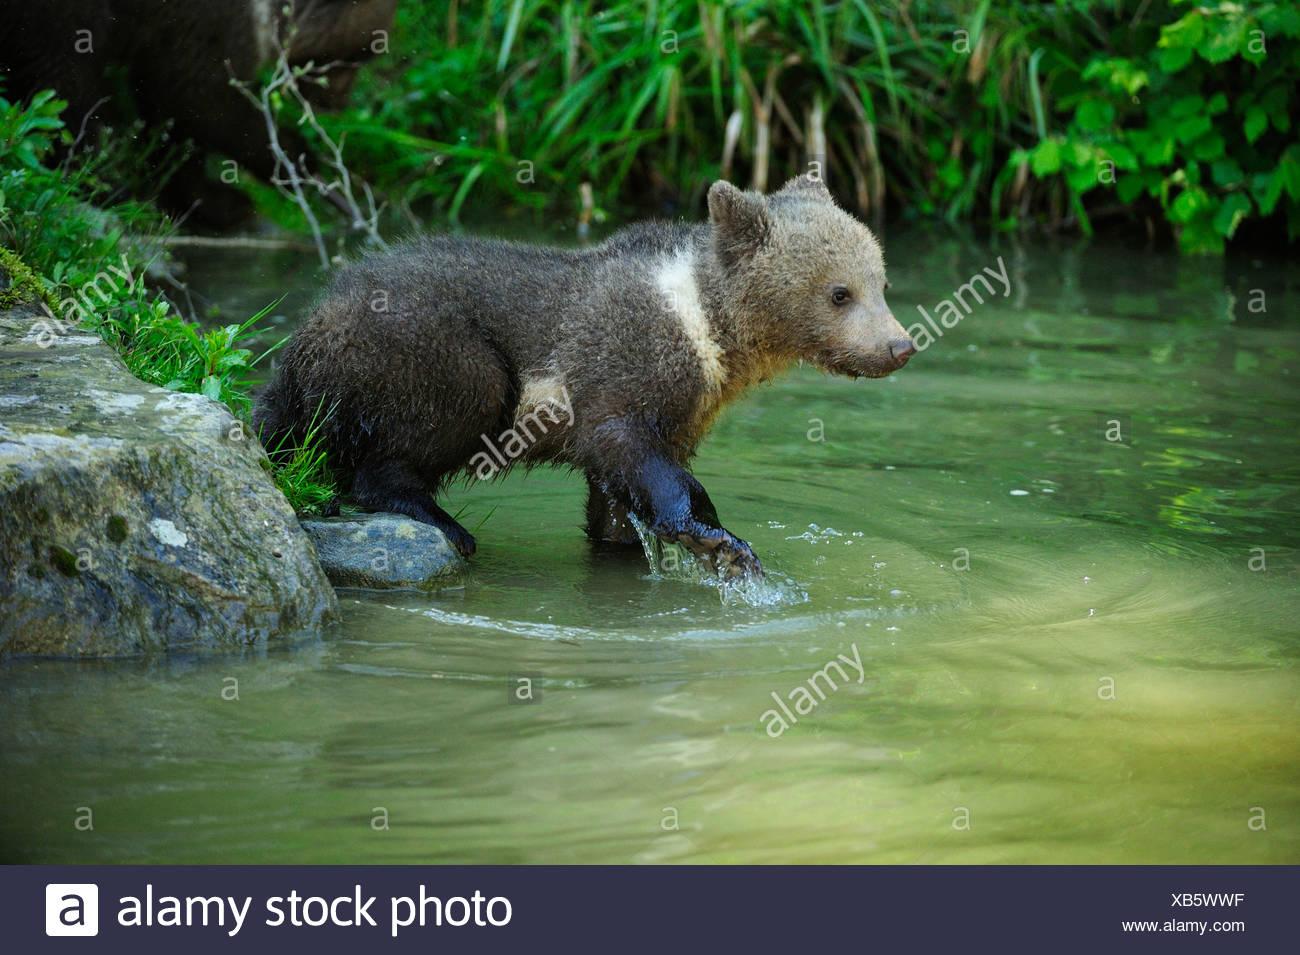 Brown Bear (Ursus arctos) cub, 4 months, walking through water, Langenberg Zoo, Adliswil, Canton of Zurich, Switzerland - Stock Image